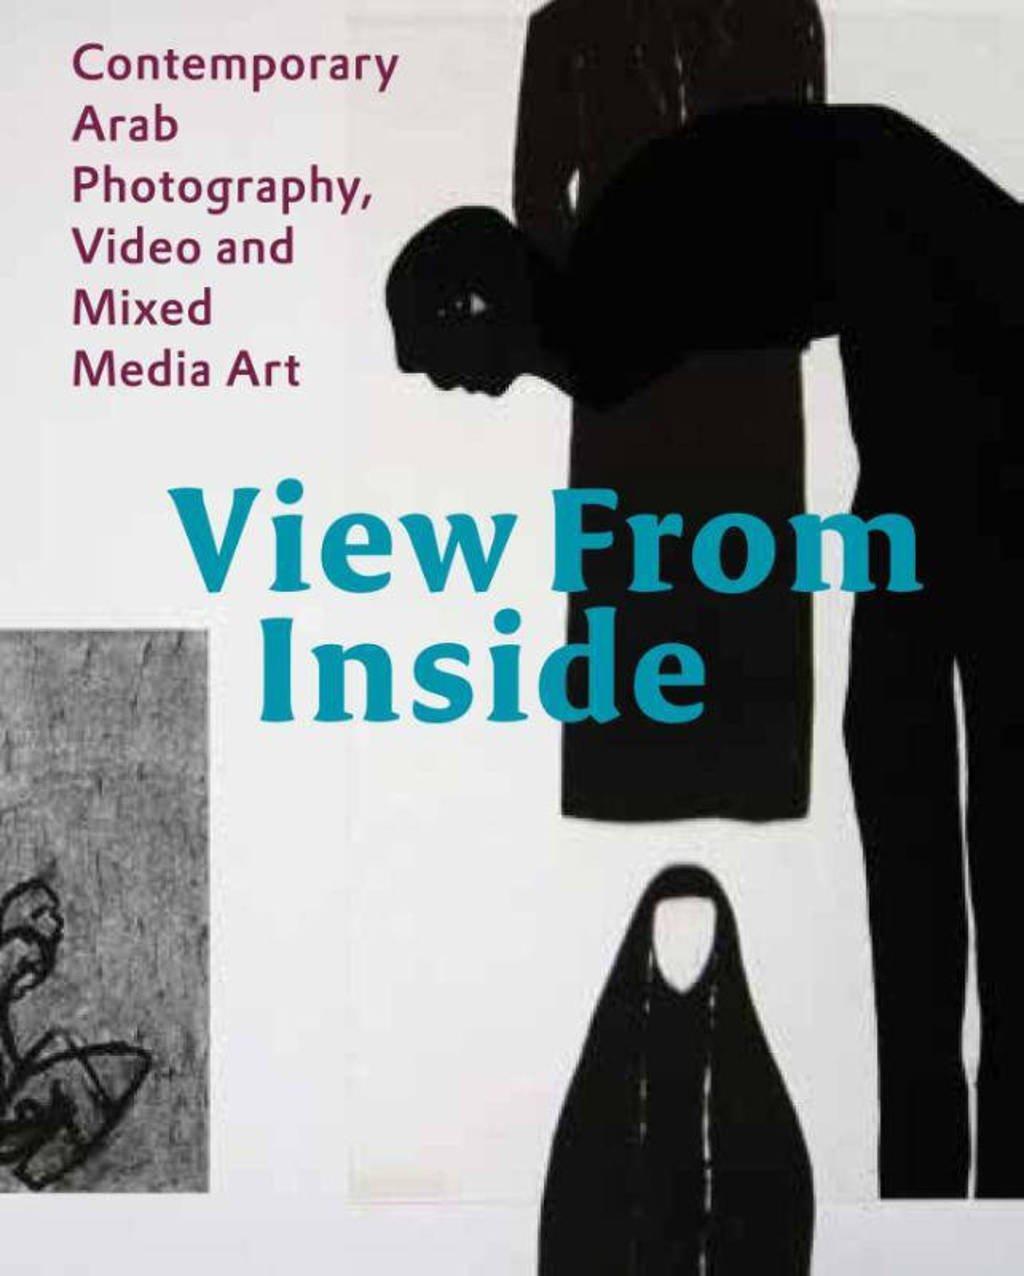 View from inside - Karin Adrian von Roques, Wendy Watriss, Samer Mohdad, e.a.